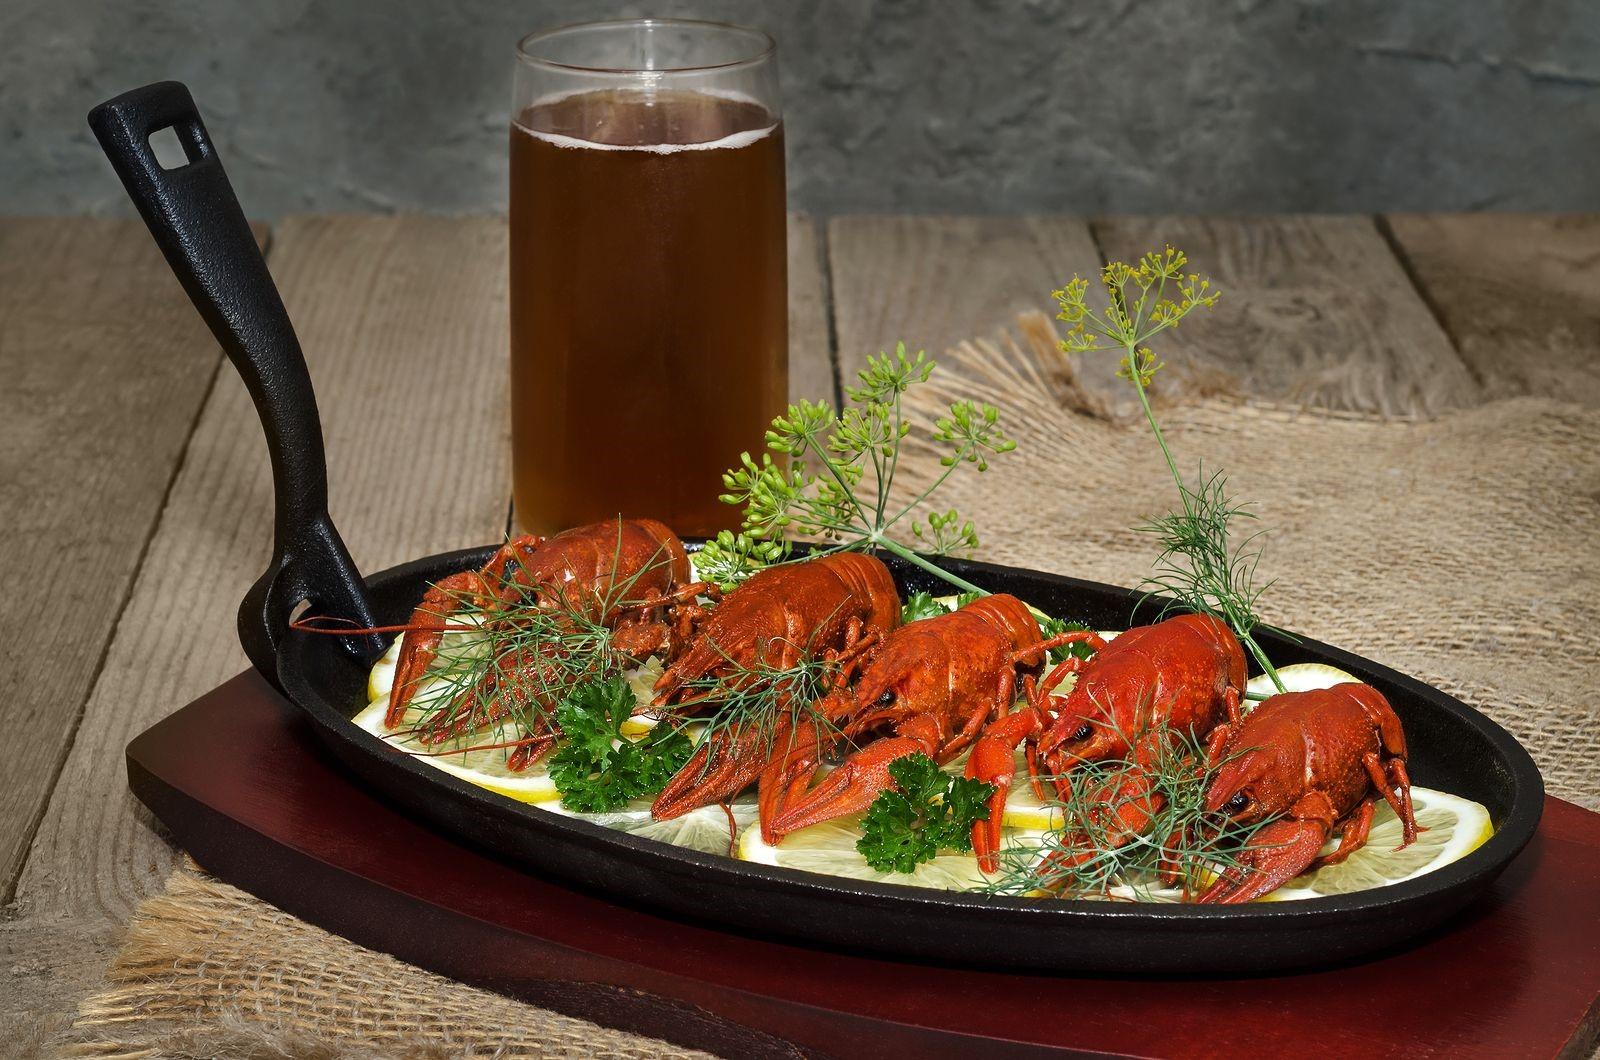 Crawfish Figures Predominantly in Cajun Seafood in Houston Restaurants